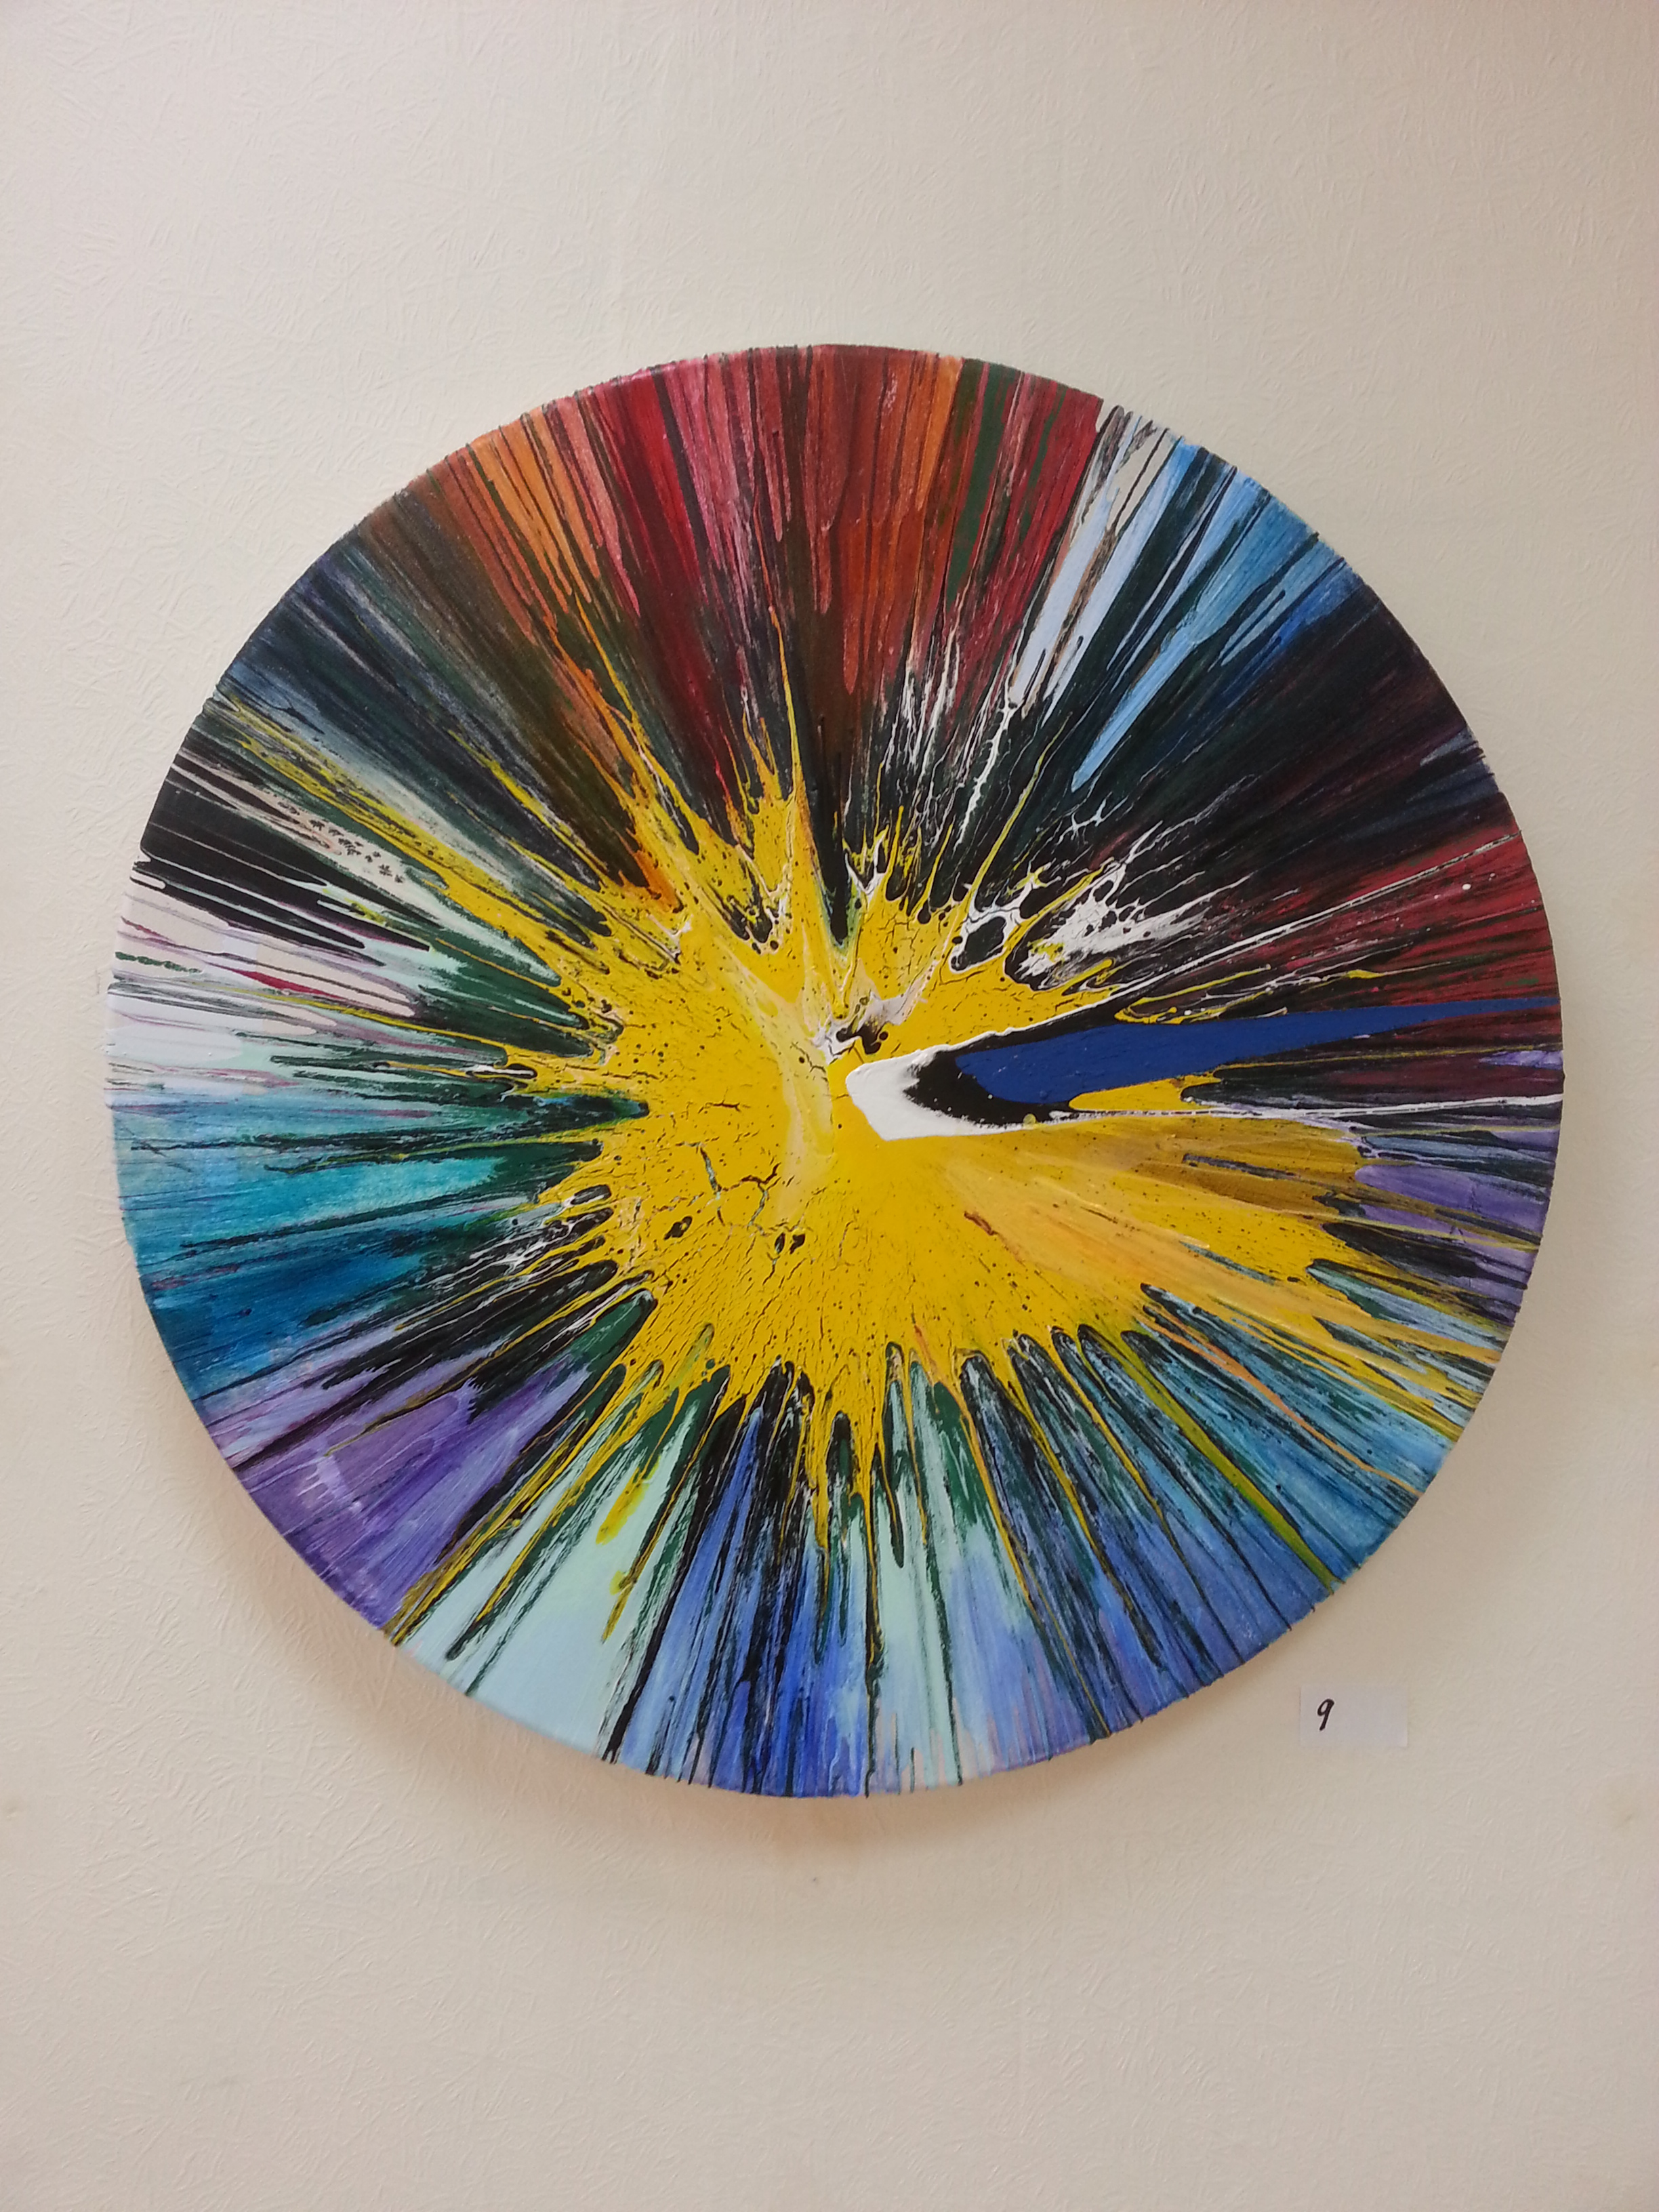 catalogue oil & acrylic abstract circular by alan dedman